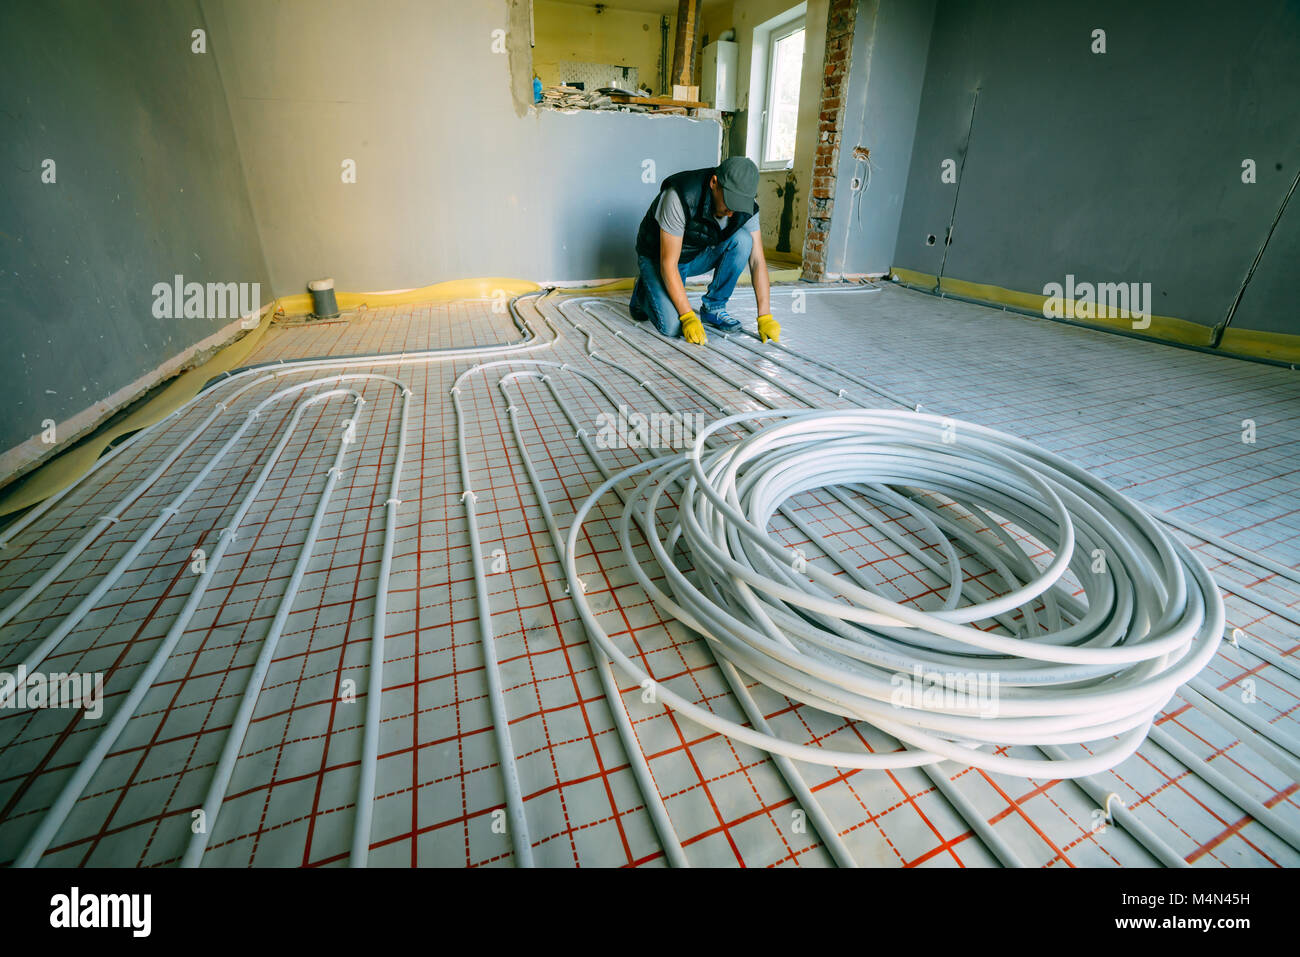 Underfloor Heating System Stock Photos & Underfloor Heating System ...